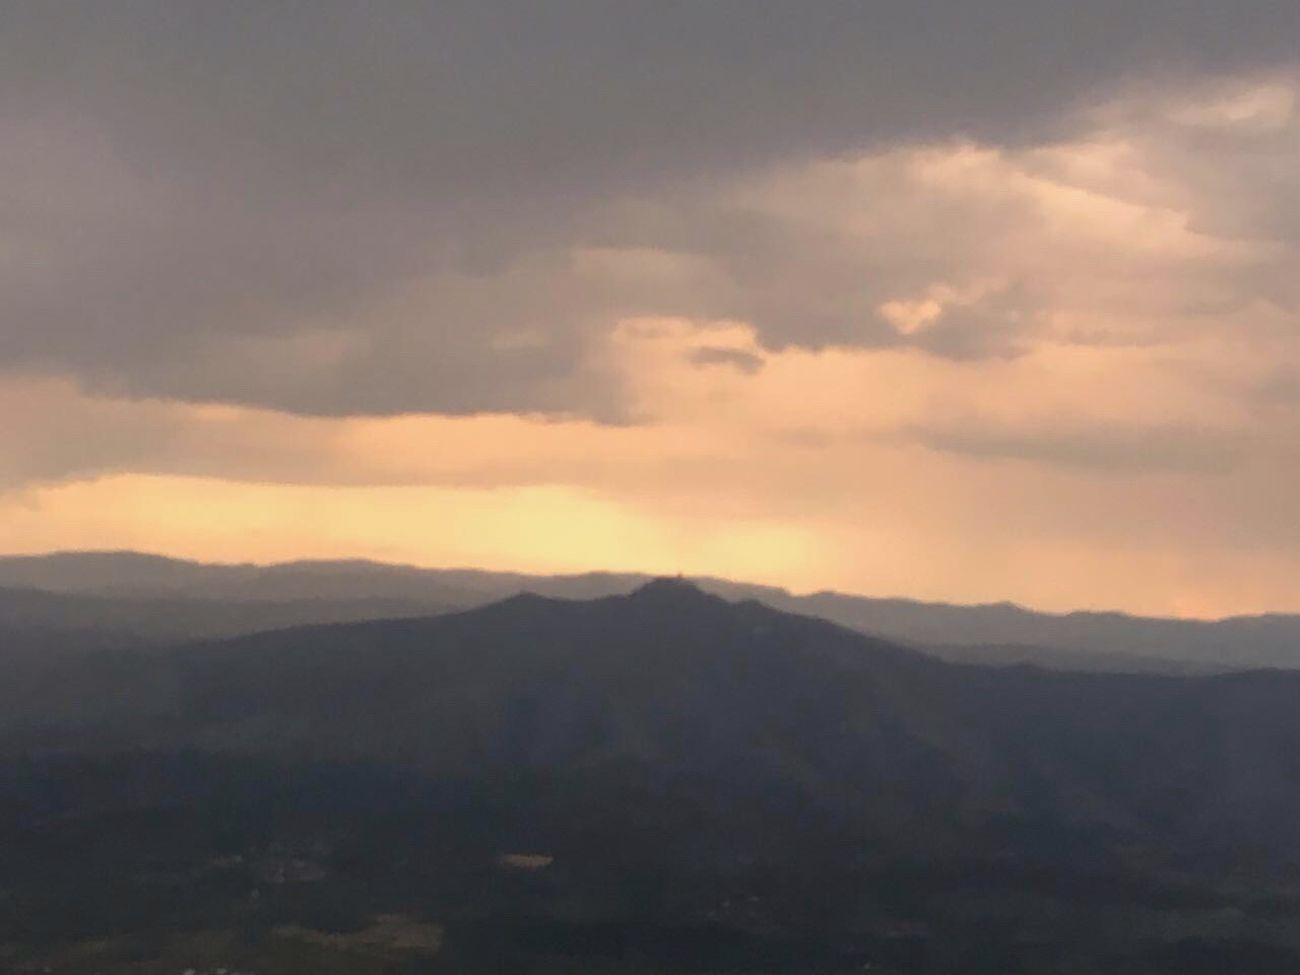 Landscape Mountain From The Plane Window High Shot Narure Sunset Sun Horizon Sunshine Clouds And Sky Family Trip Summer Tadaa Community Tadaa Friends Pink Light Tadaabestshot Tadaa